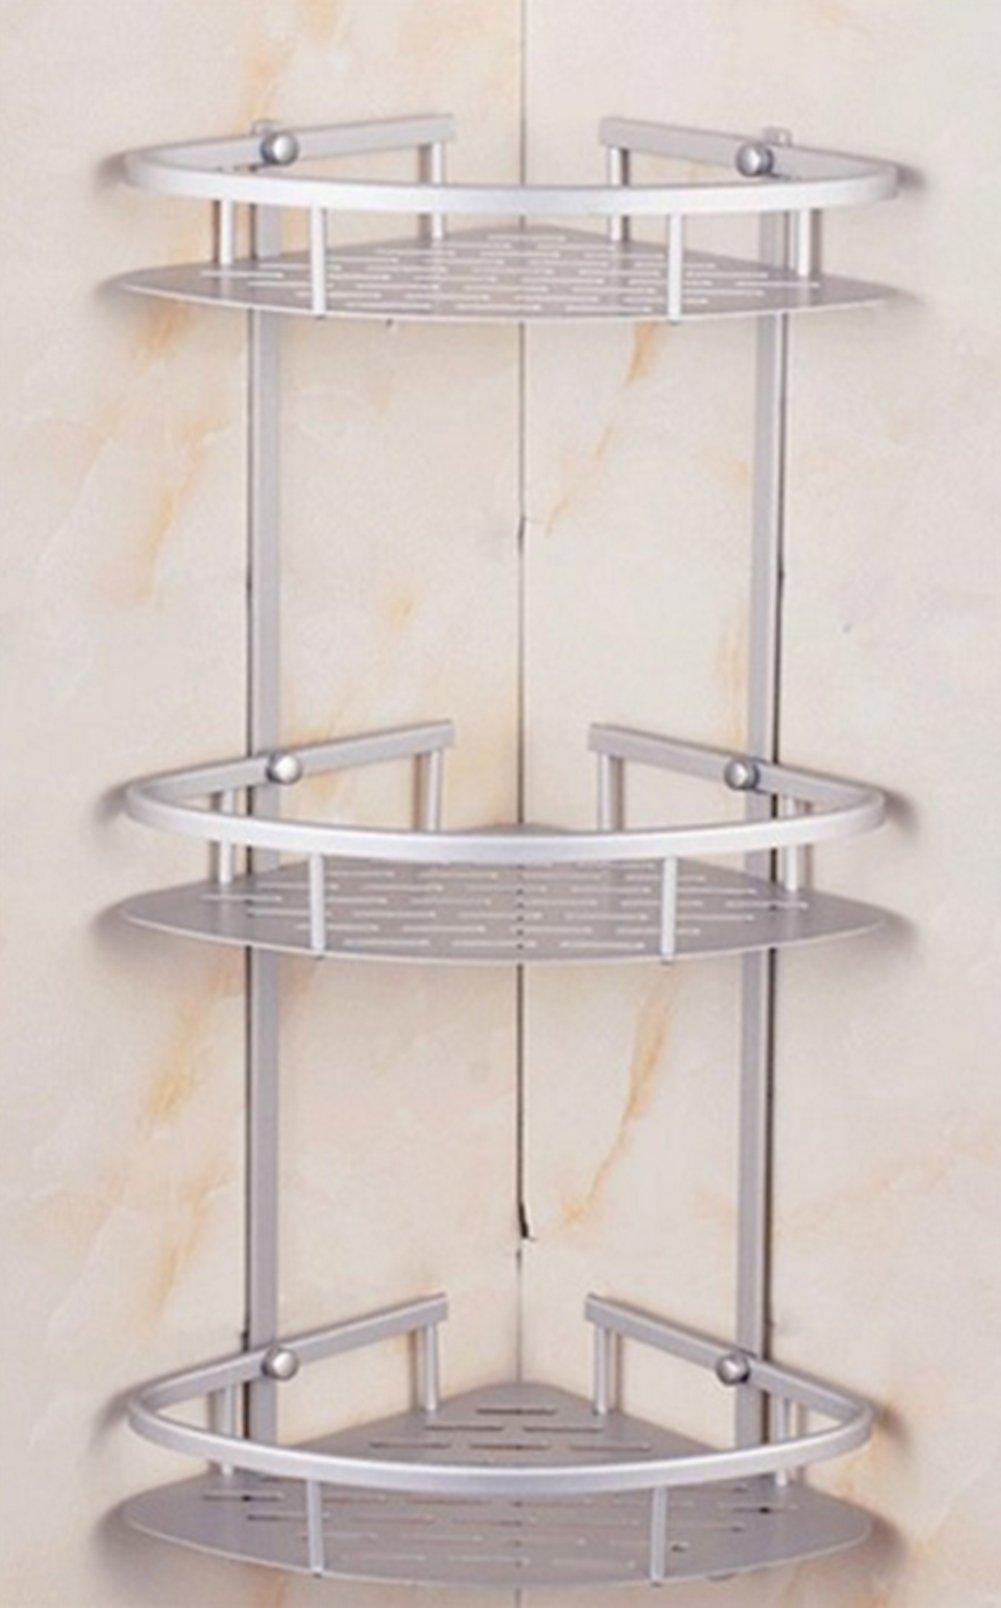 Aluminum Bathroom 2-Tier Corner Shelf Basket Wall Mounted, Silver Sand Sprayed (3 Tier)